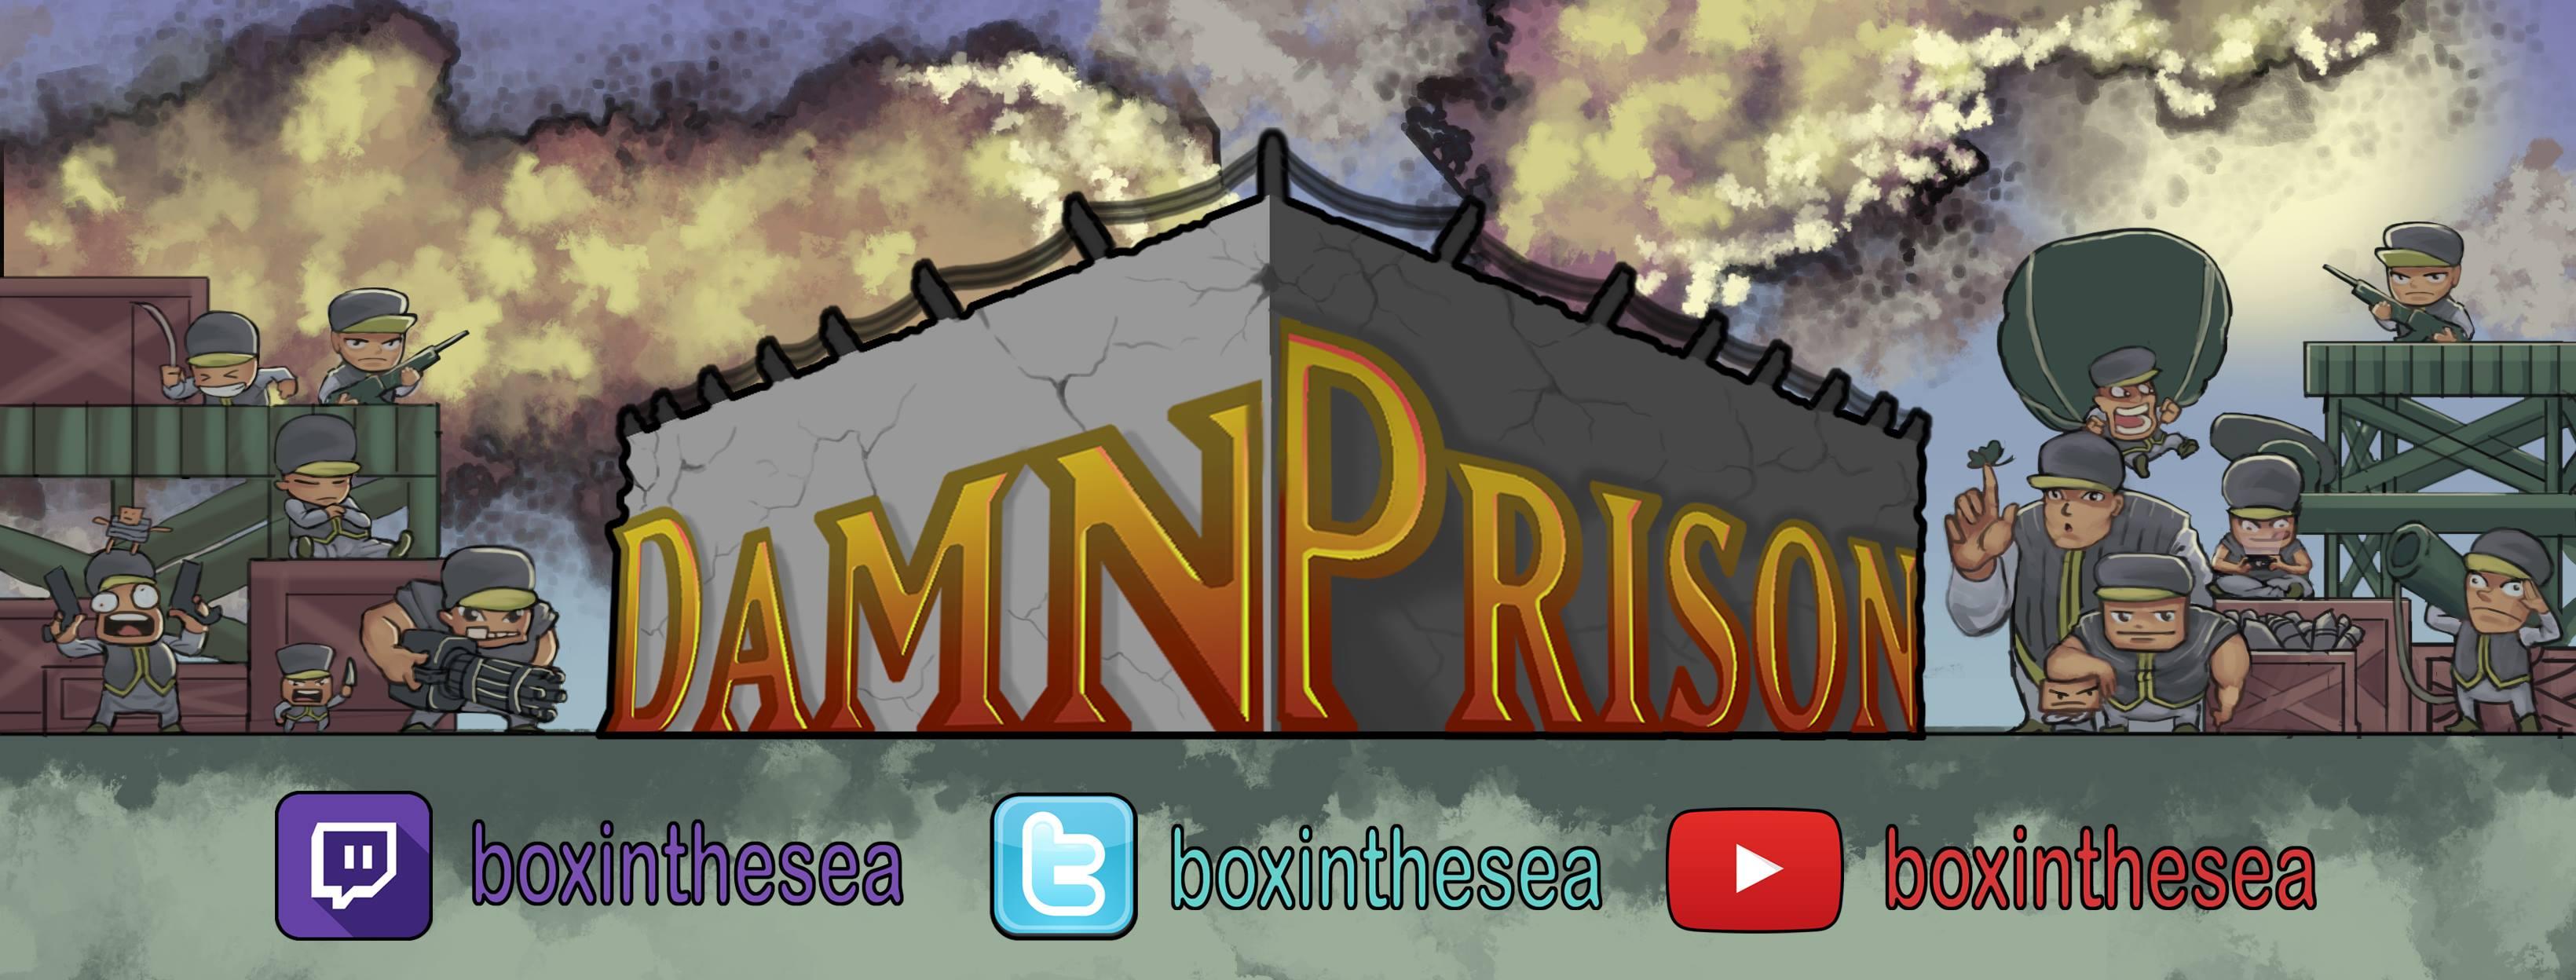 DAMN PRISON